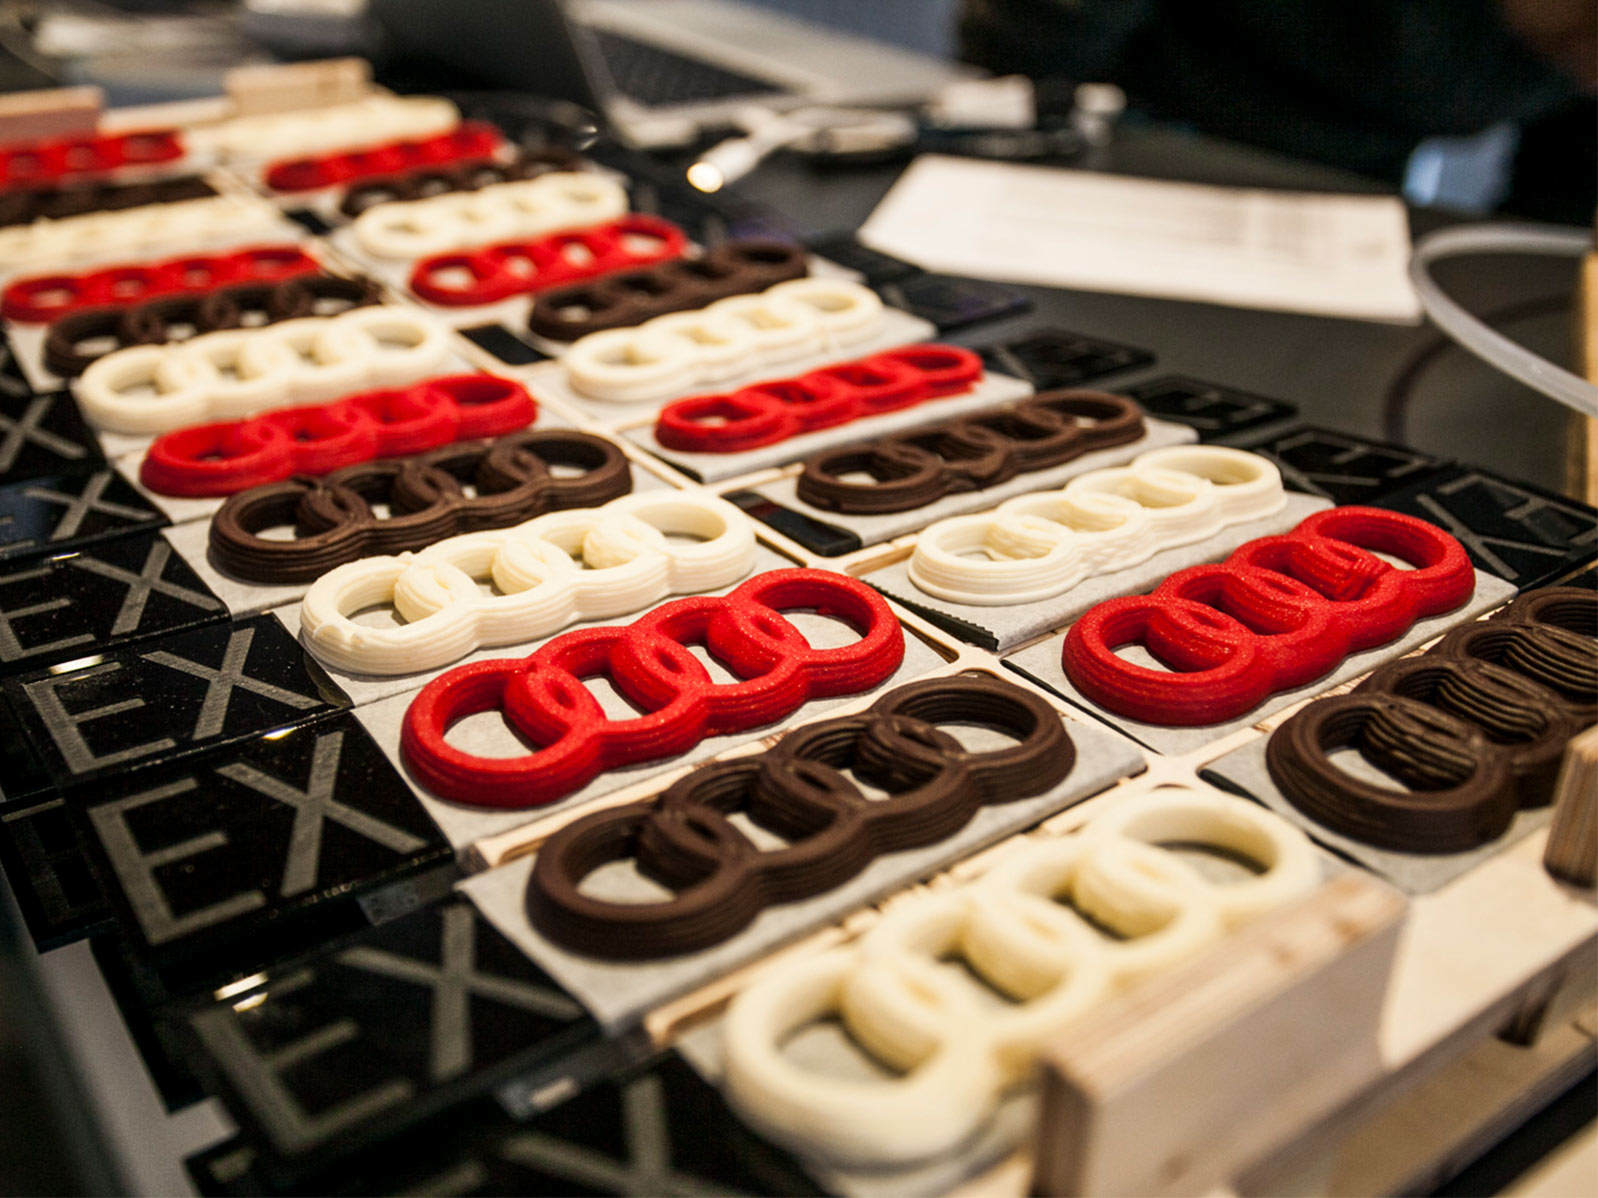 Conferencia sobre impresión 3d comestible dada por EXarchitects para el evento de presentación del Audi e-tron